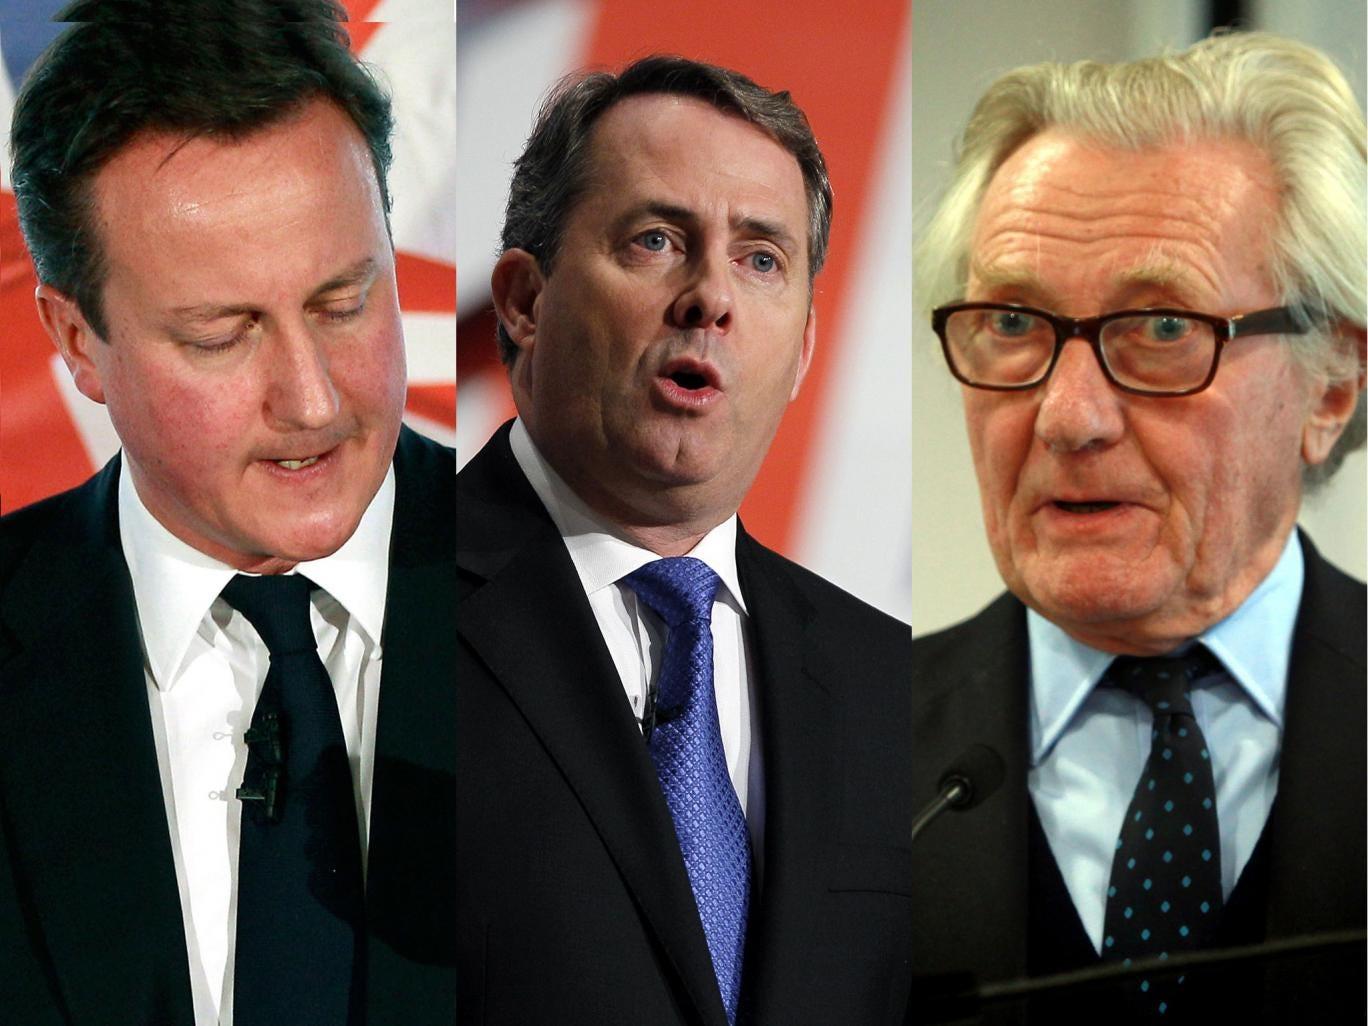 Shades of blue: David Cameron, Liam Fox and Michael Heseltine